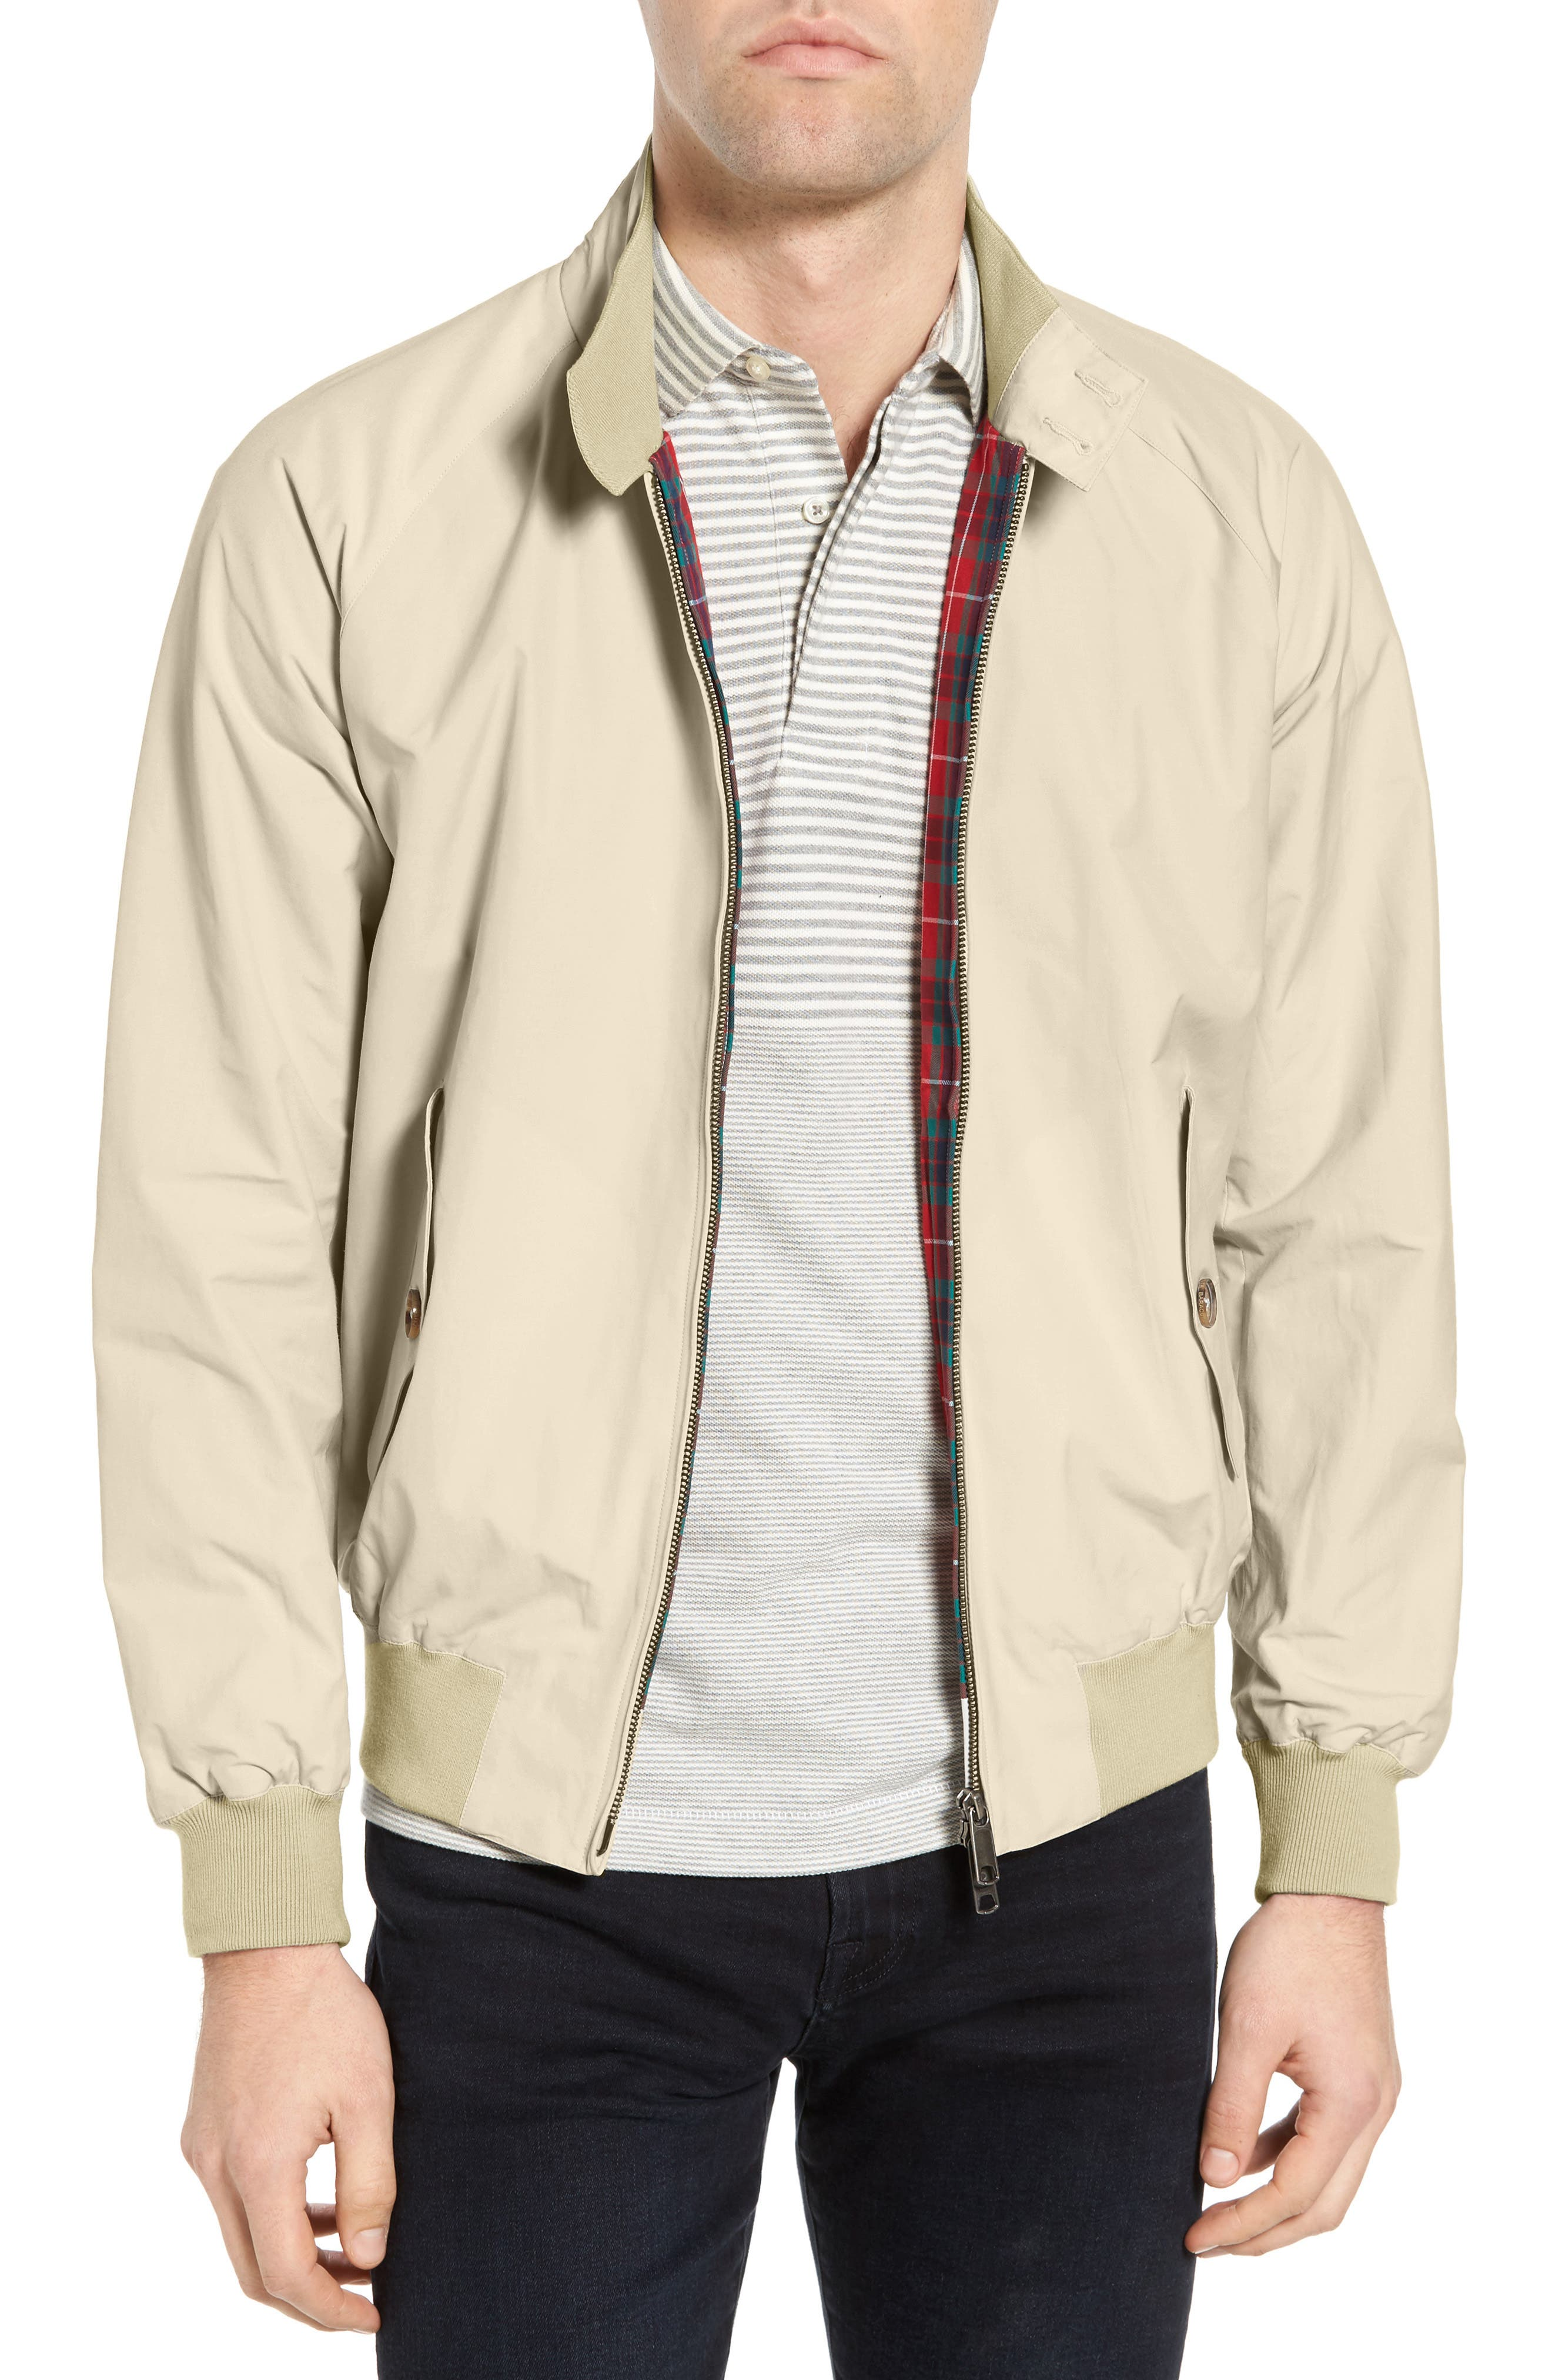 Baracuta G9 Water Resistant Harrington Jacket